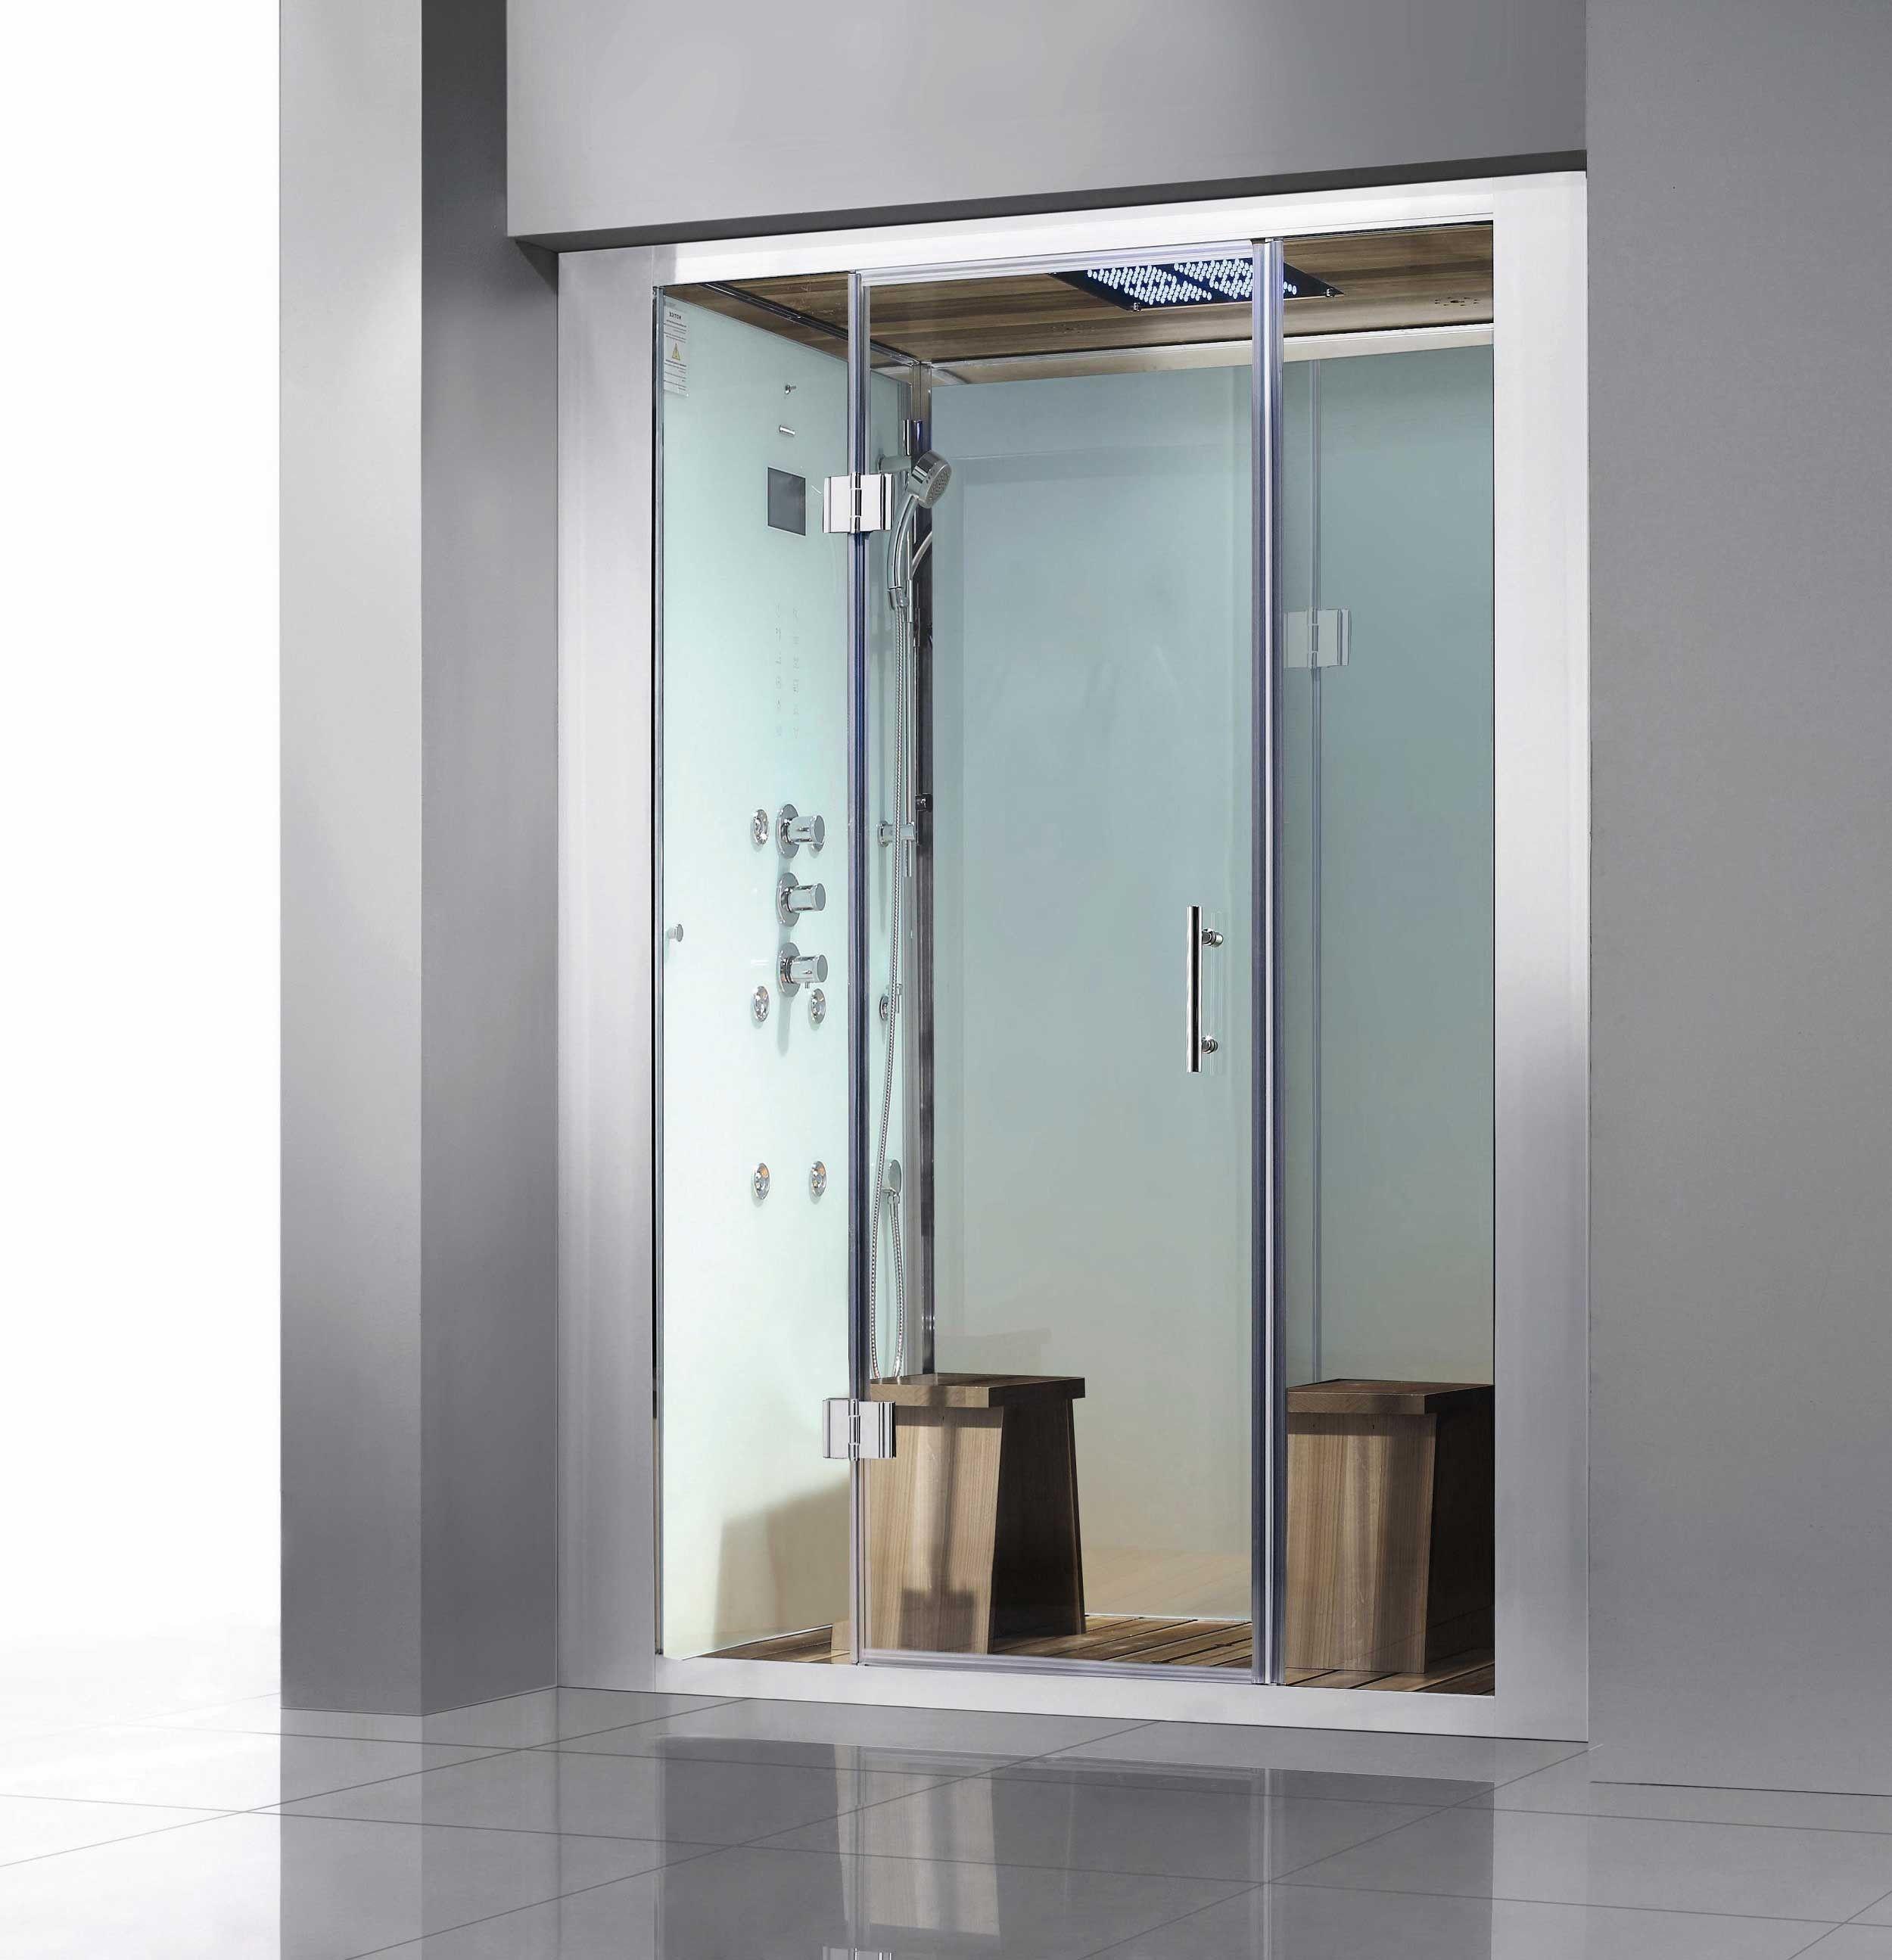 White Brunswick Steam Shower | House | Pinterest | Steam showers ...